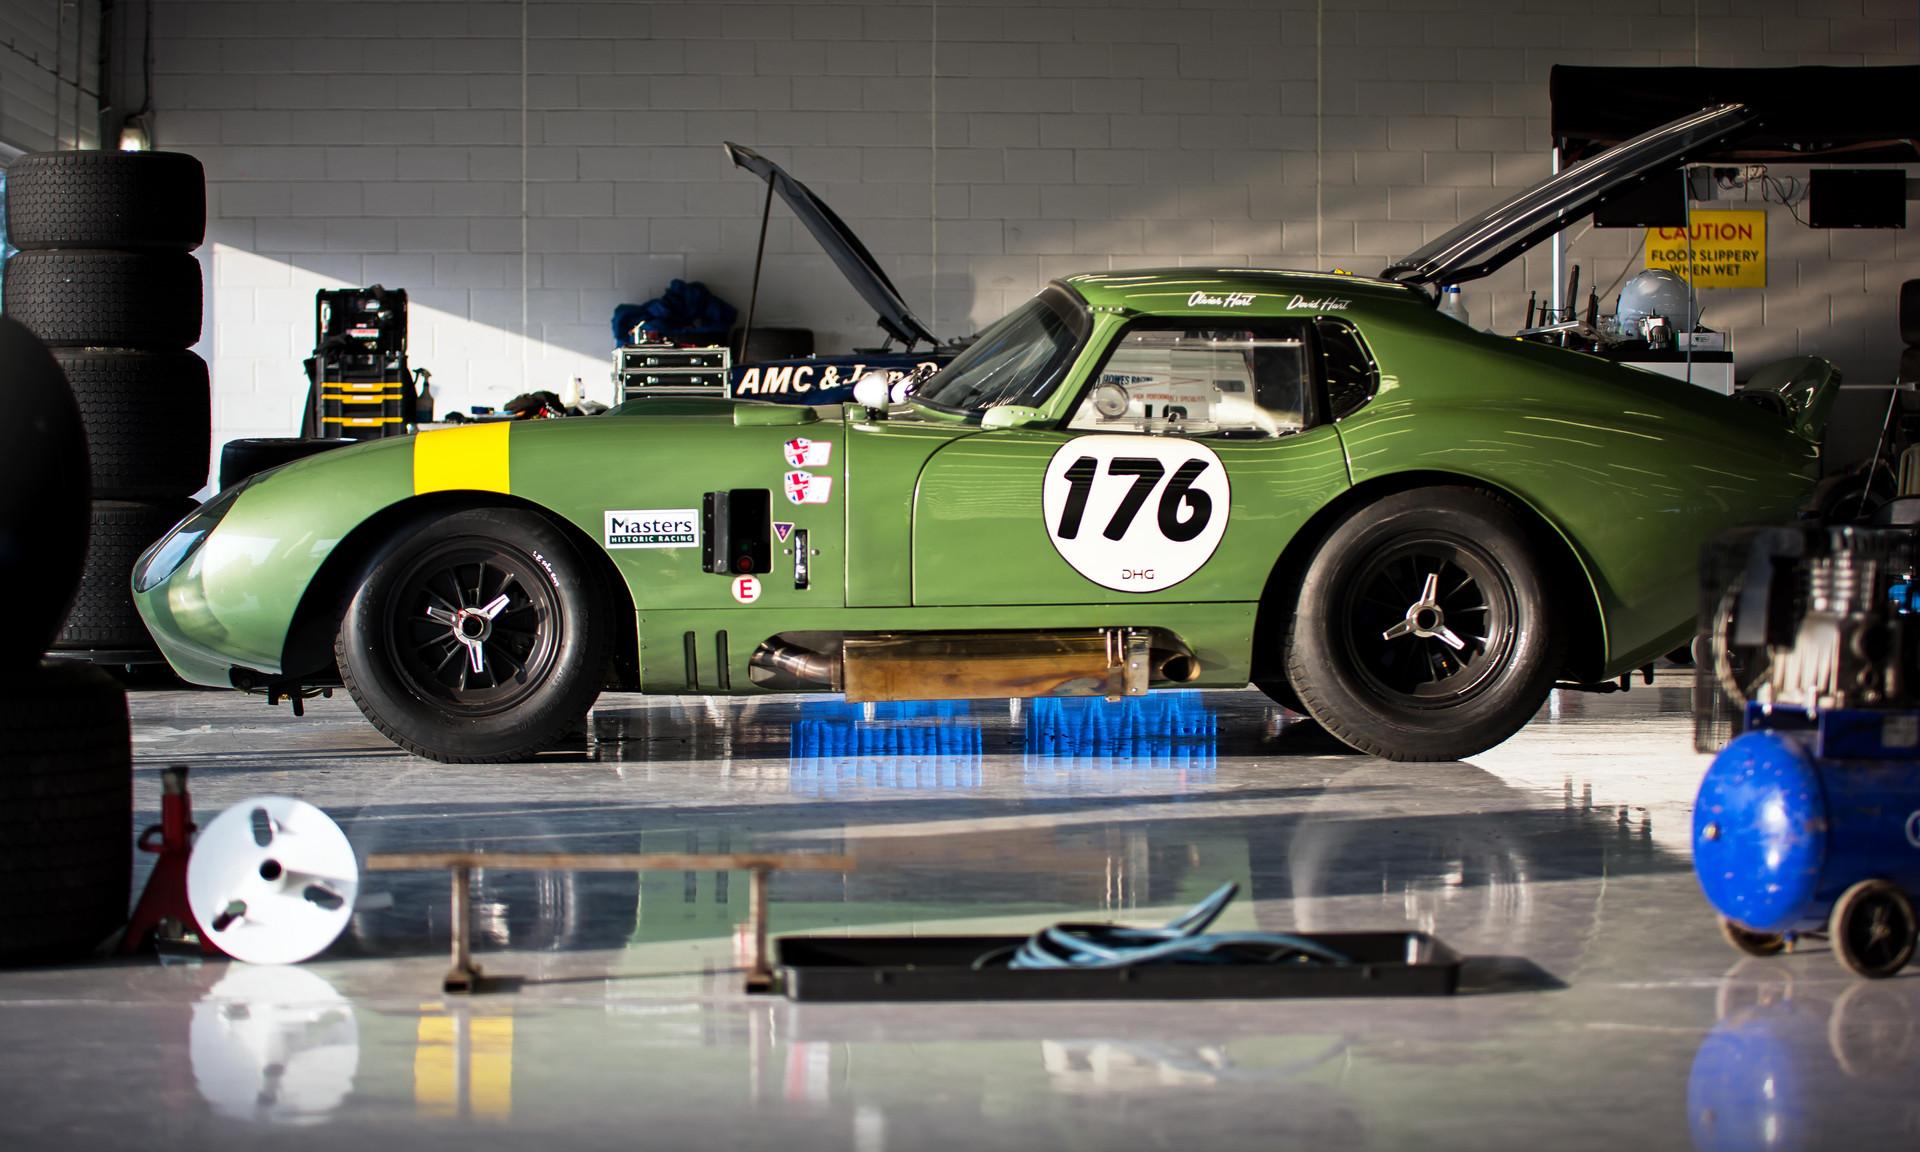 David & Olivier Hart's Shelby Daytona Cobra